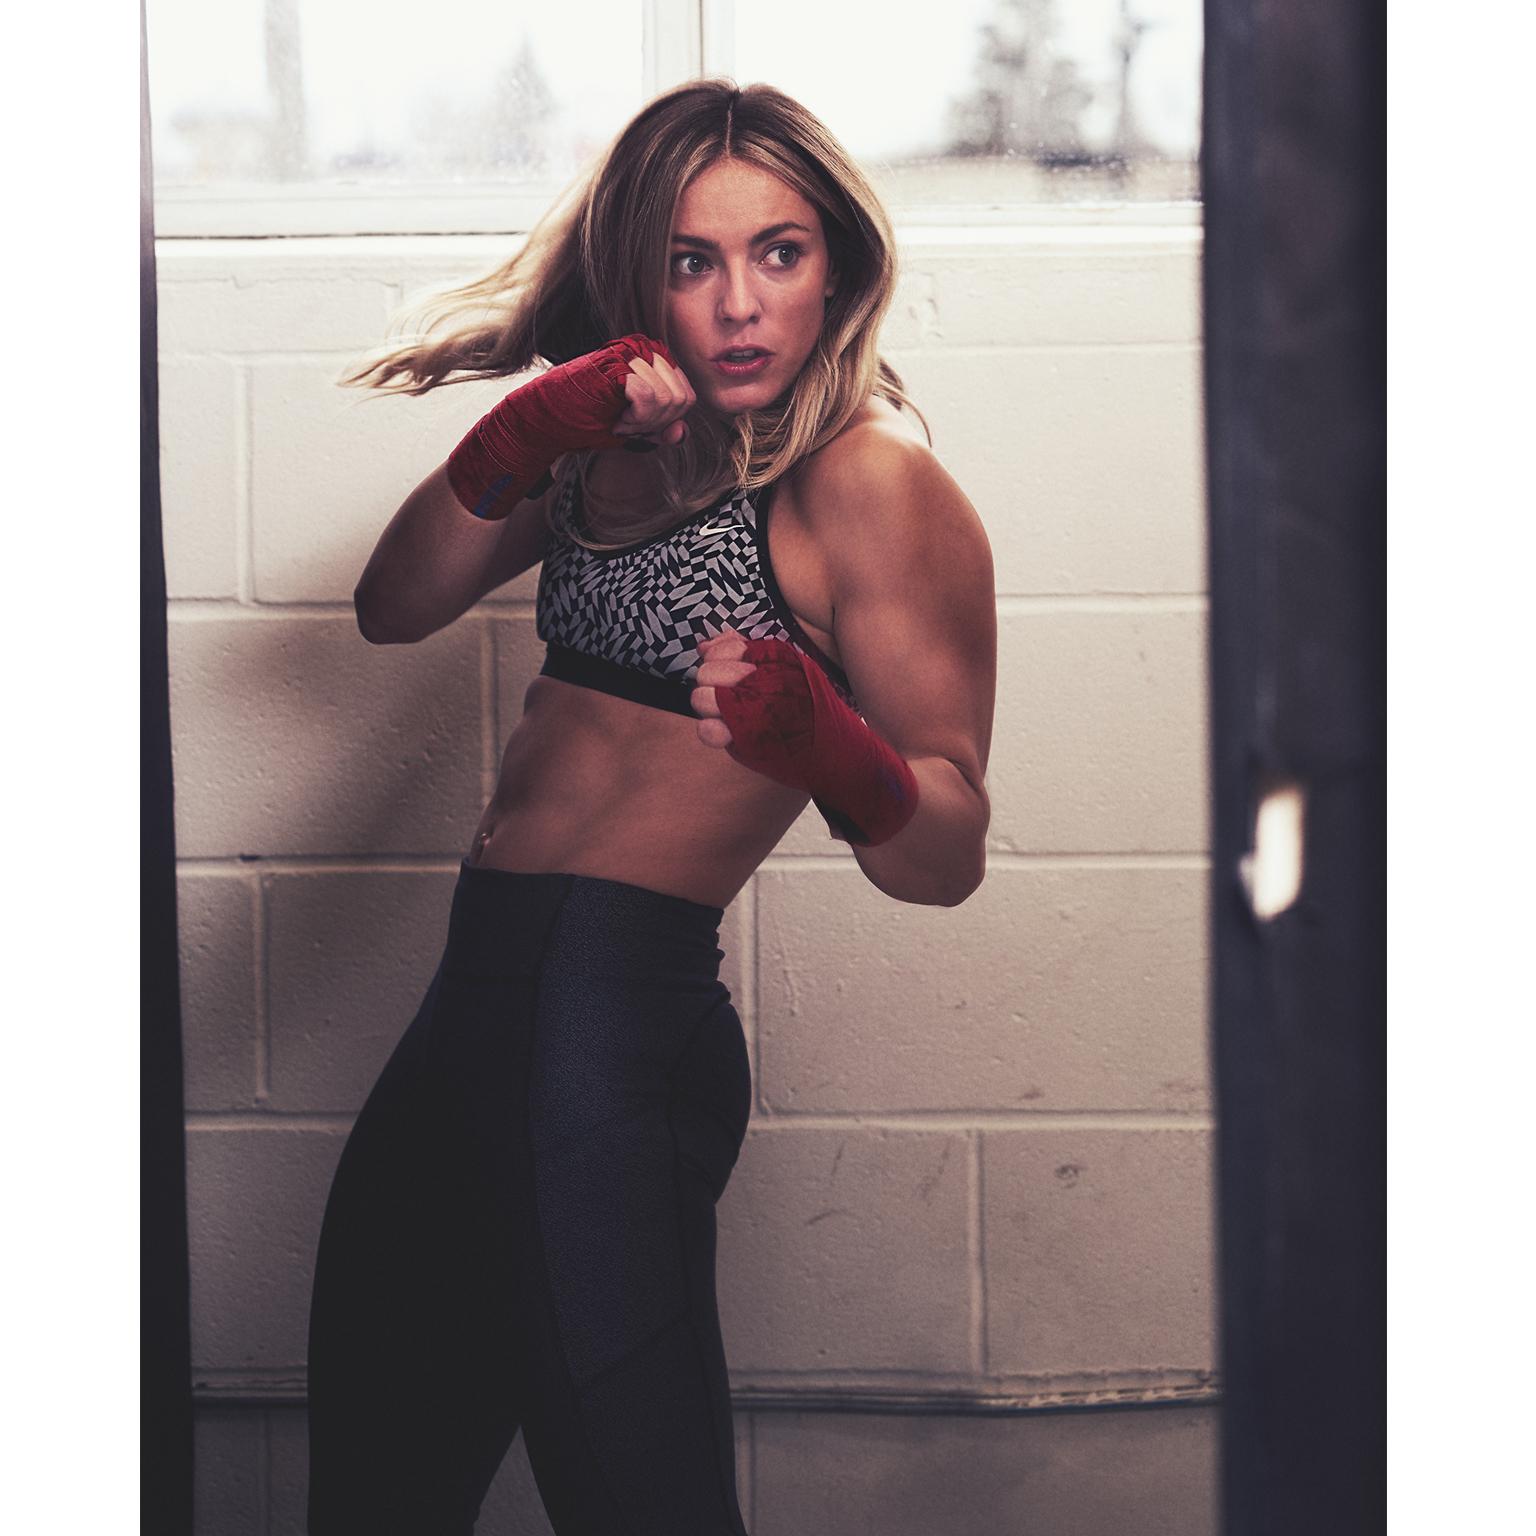 Toronto-Fitness-Model-Agency-Boxing-Commercial-Leslie-Bonniveau